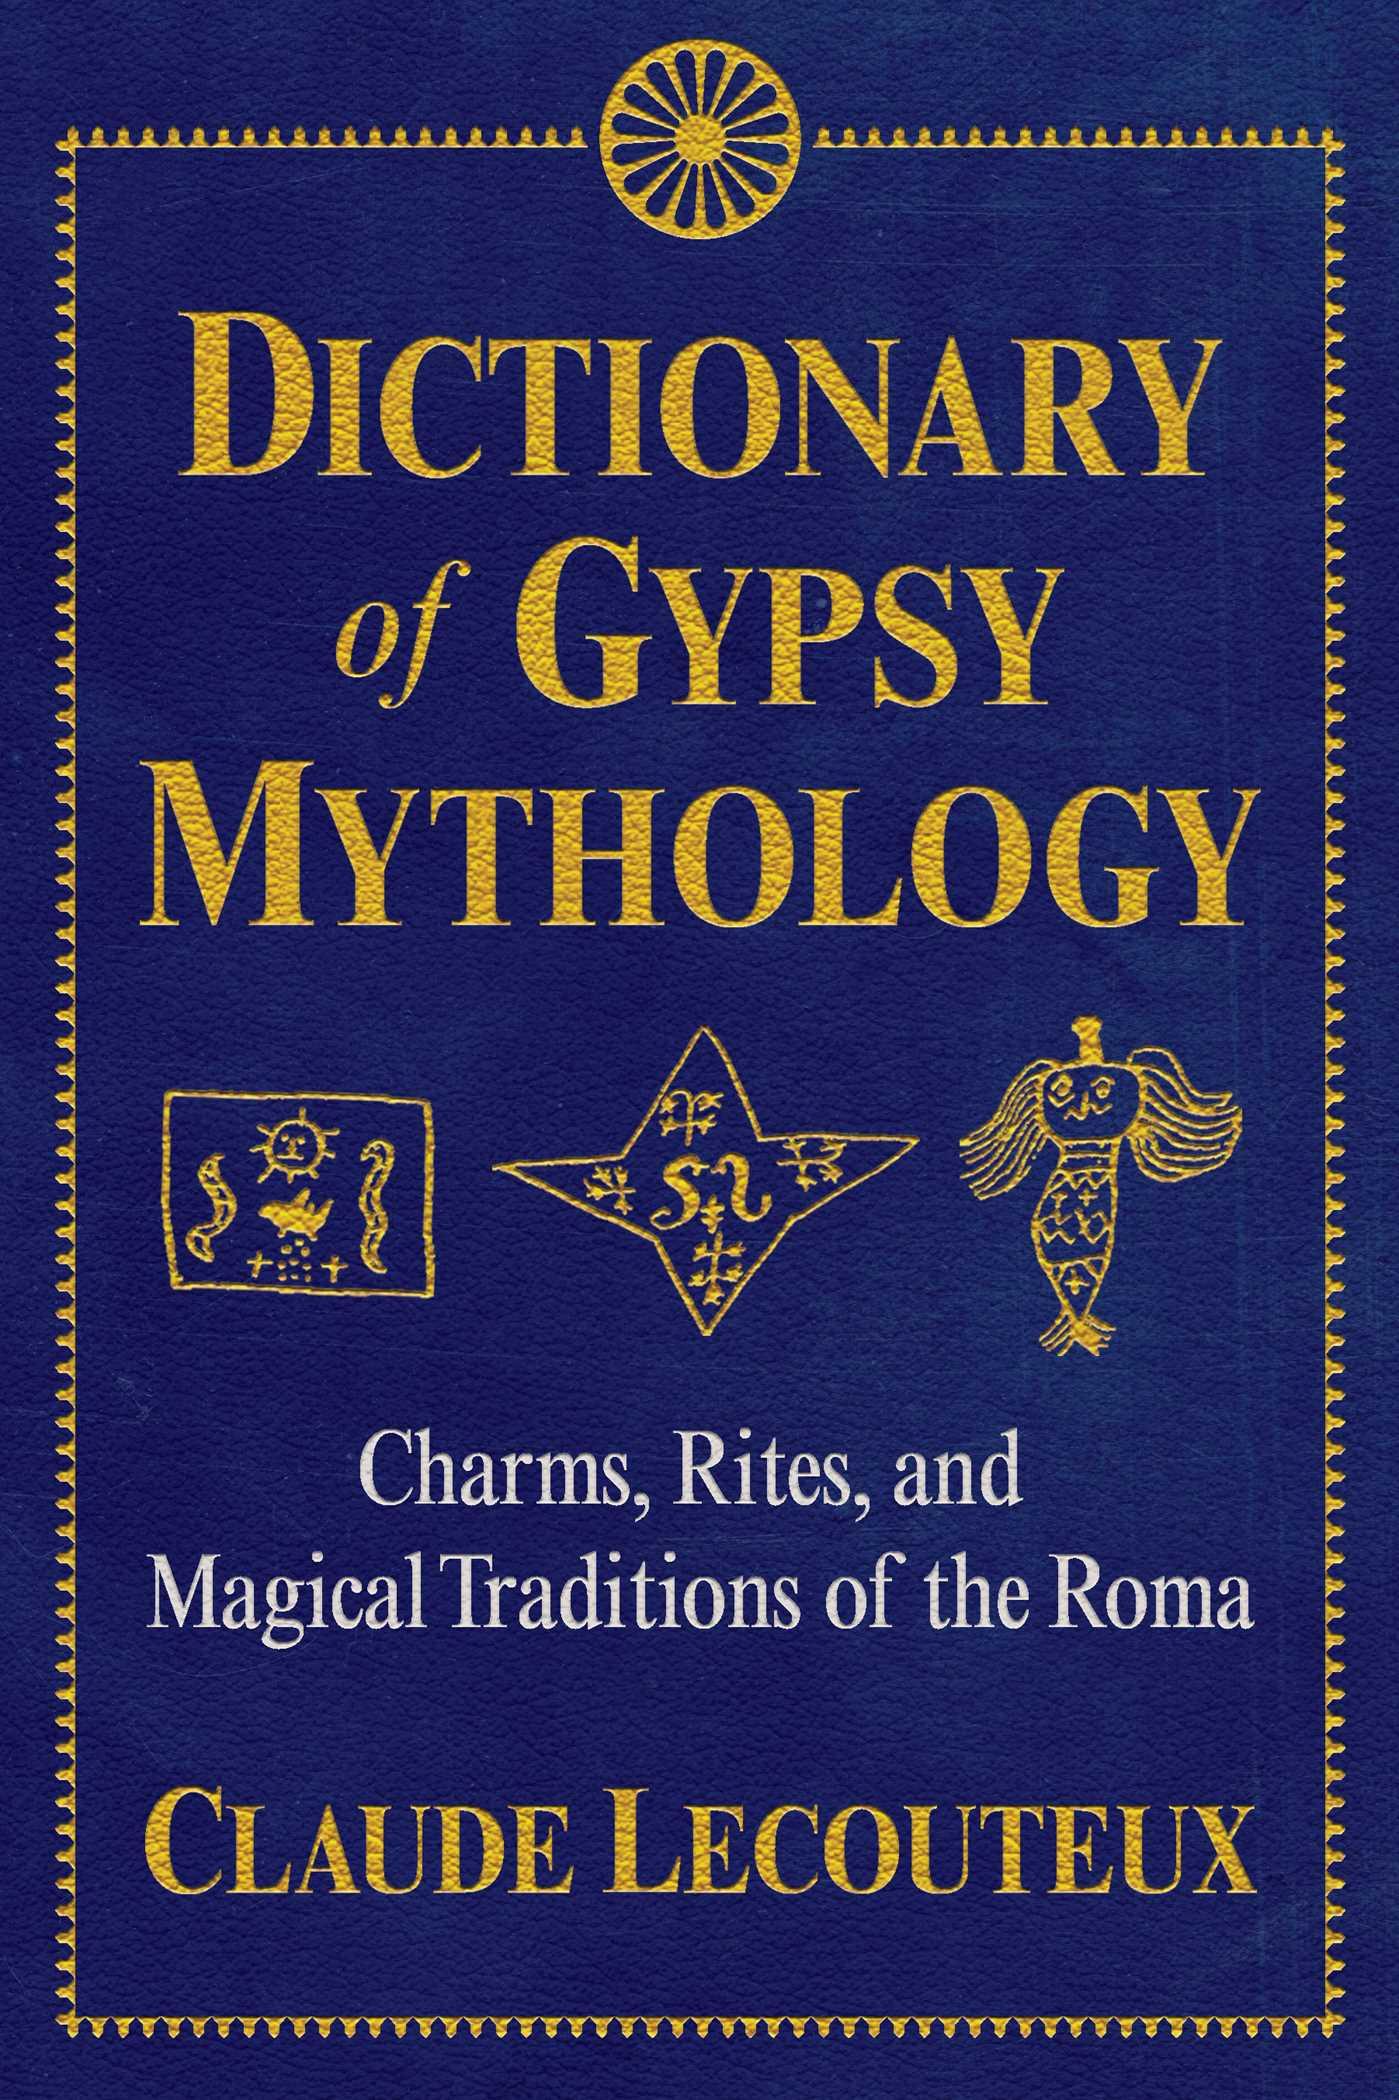 Dictionary of gypsy mythology 9781620556672 hr